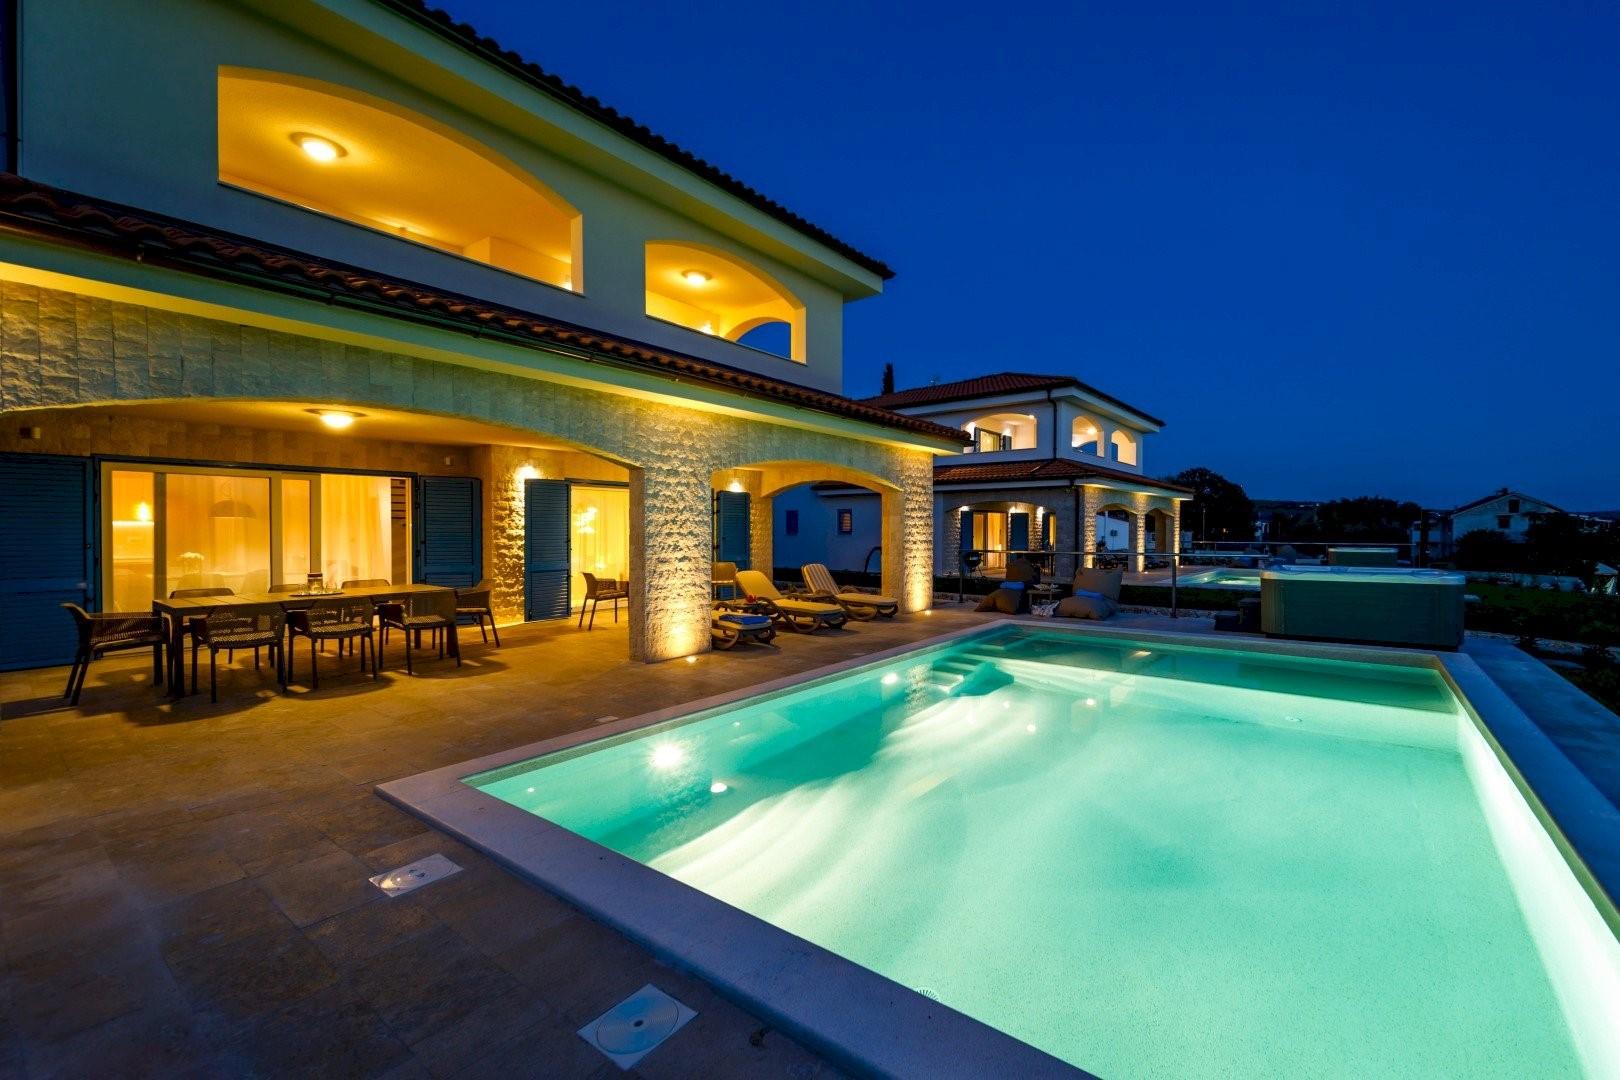 Ferienhaus Luxury Villa Loma 1 (2586644), Sveti Vid-Miholjice, Insel Krk, Kvarner, Kroatien, Bild 2